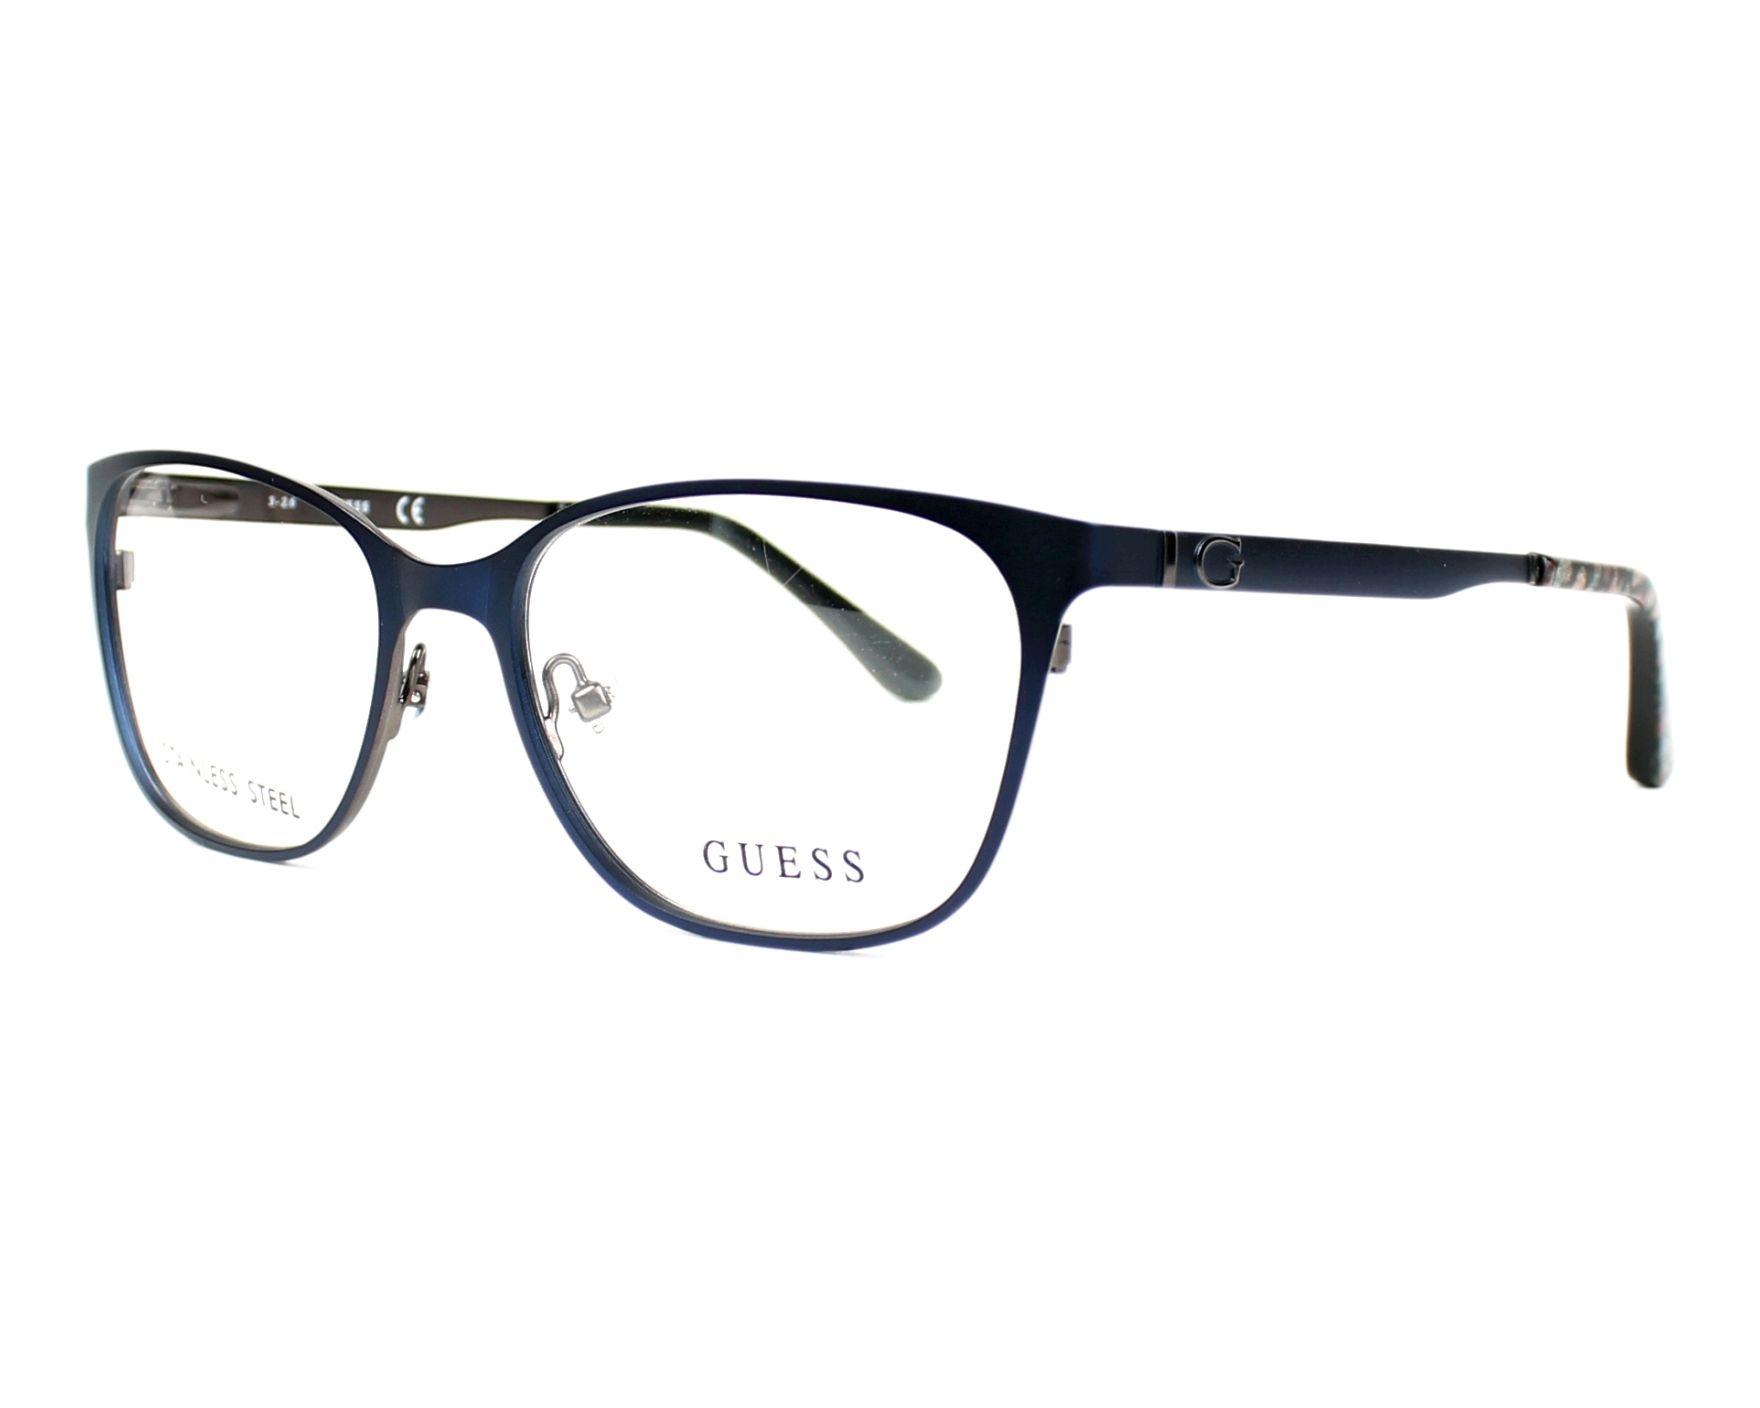 eyeglasses Guess GU-2629 091 - Blue Brown profile view